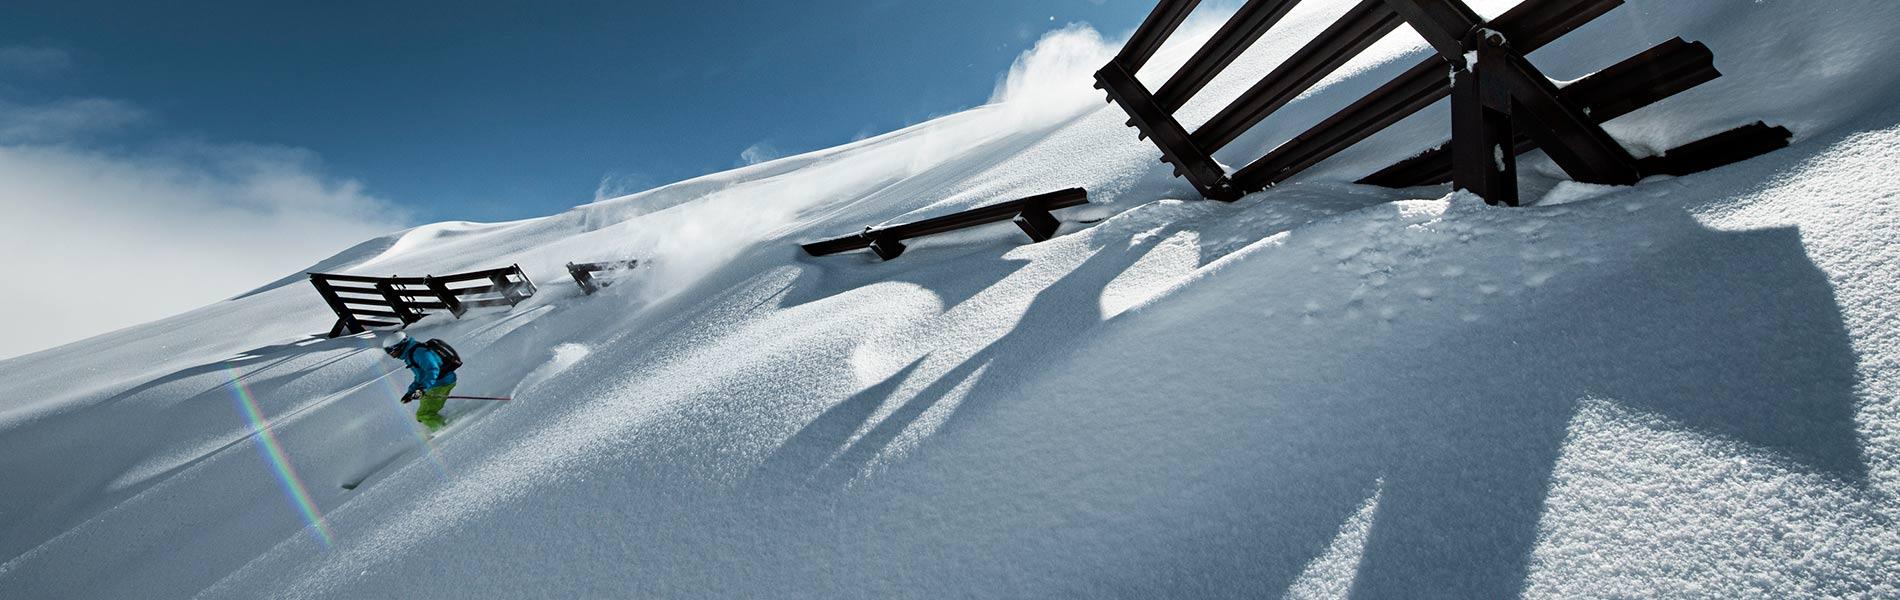 Skiurlaub in Tirol im Hotel Happy Stubai Hostel Neustift Stubaital